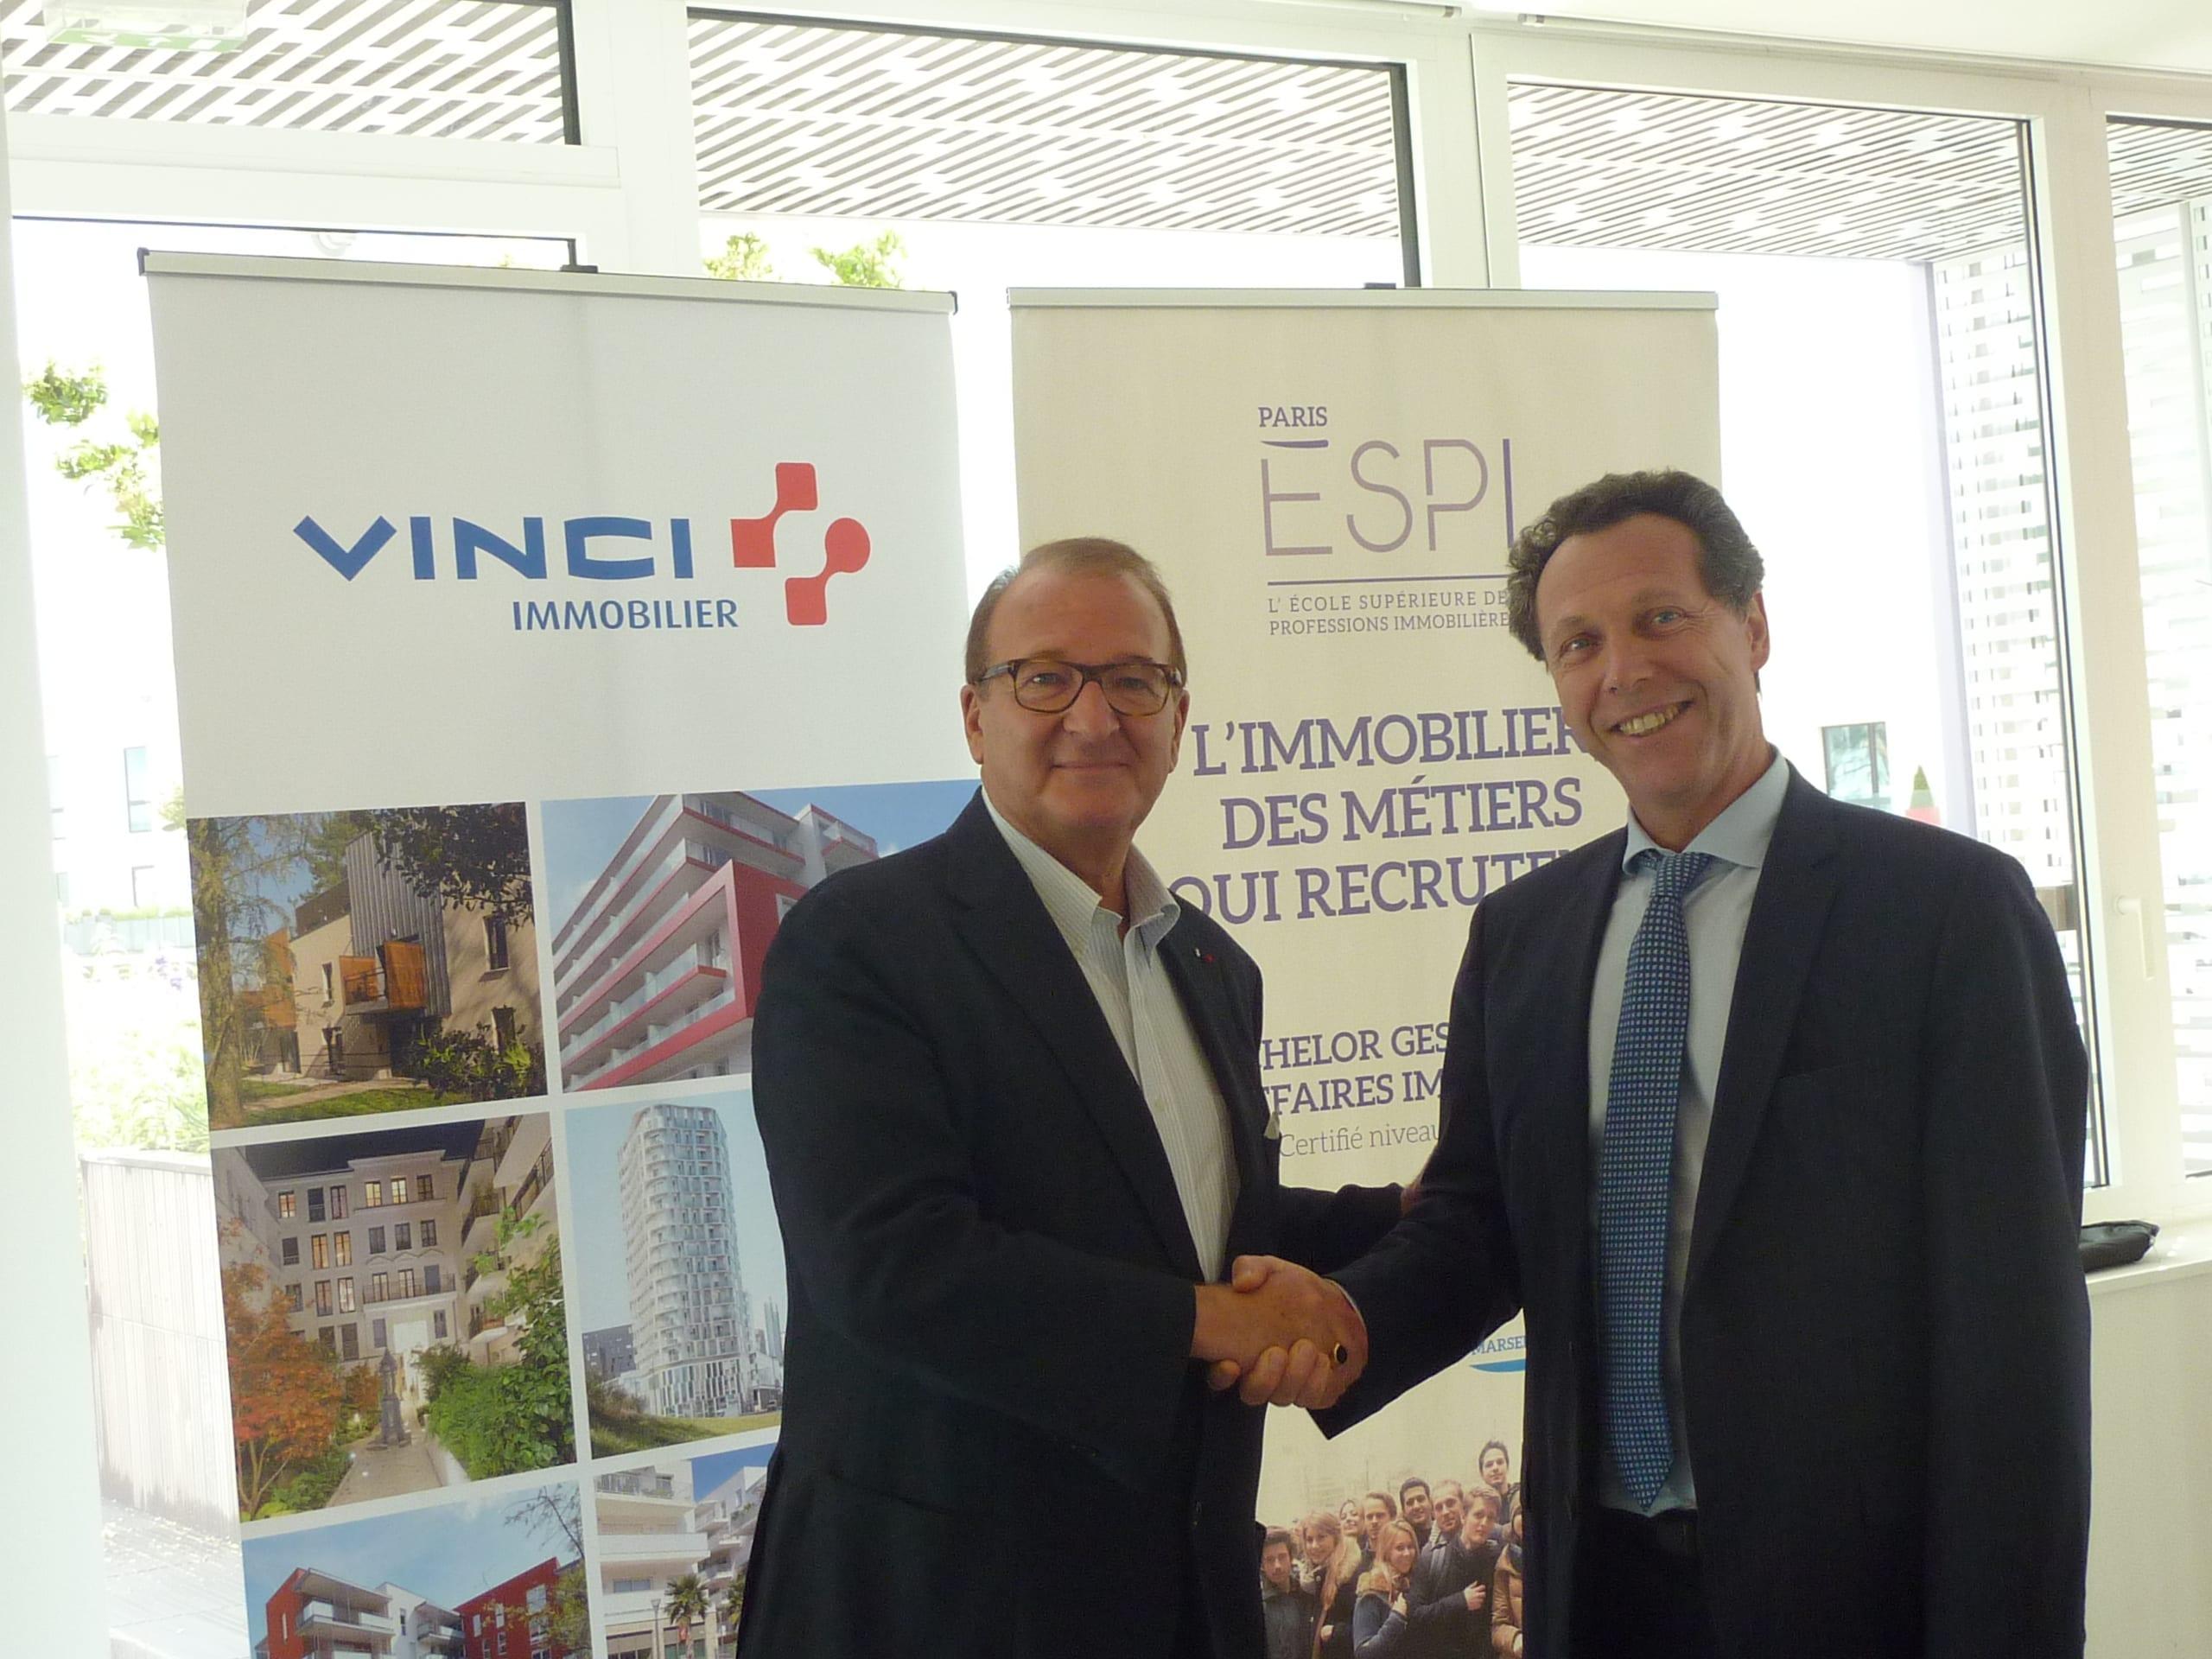 Partenariat Vinci Immo 27 06 2016 (9)